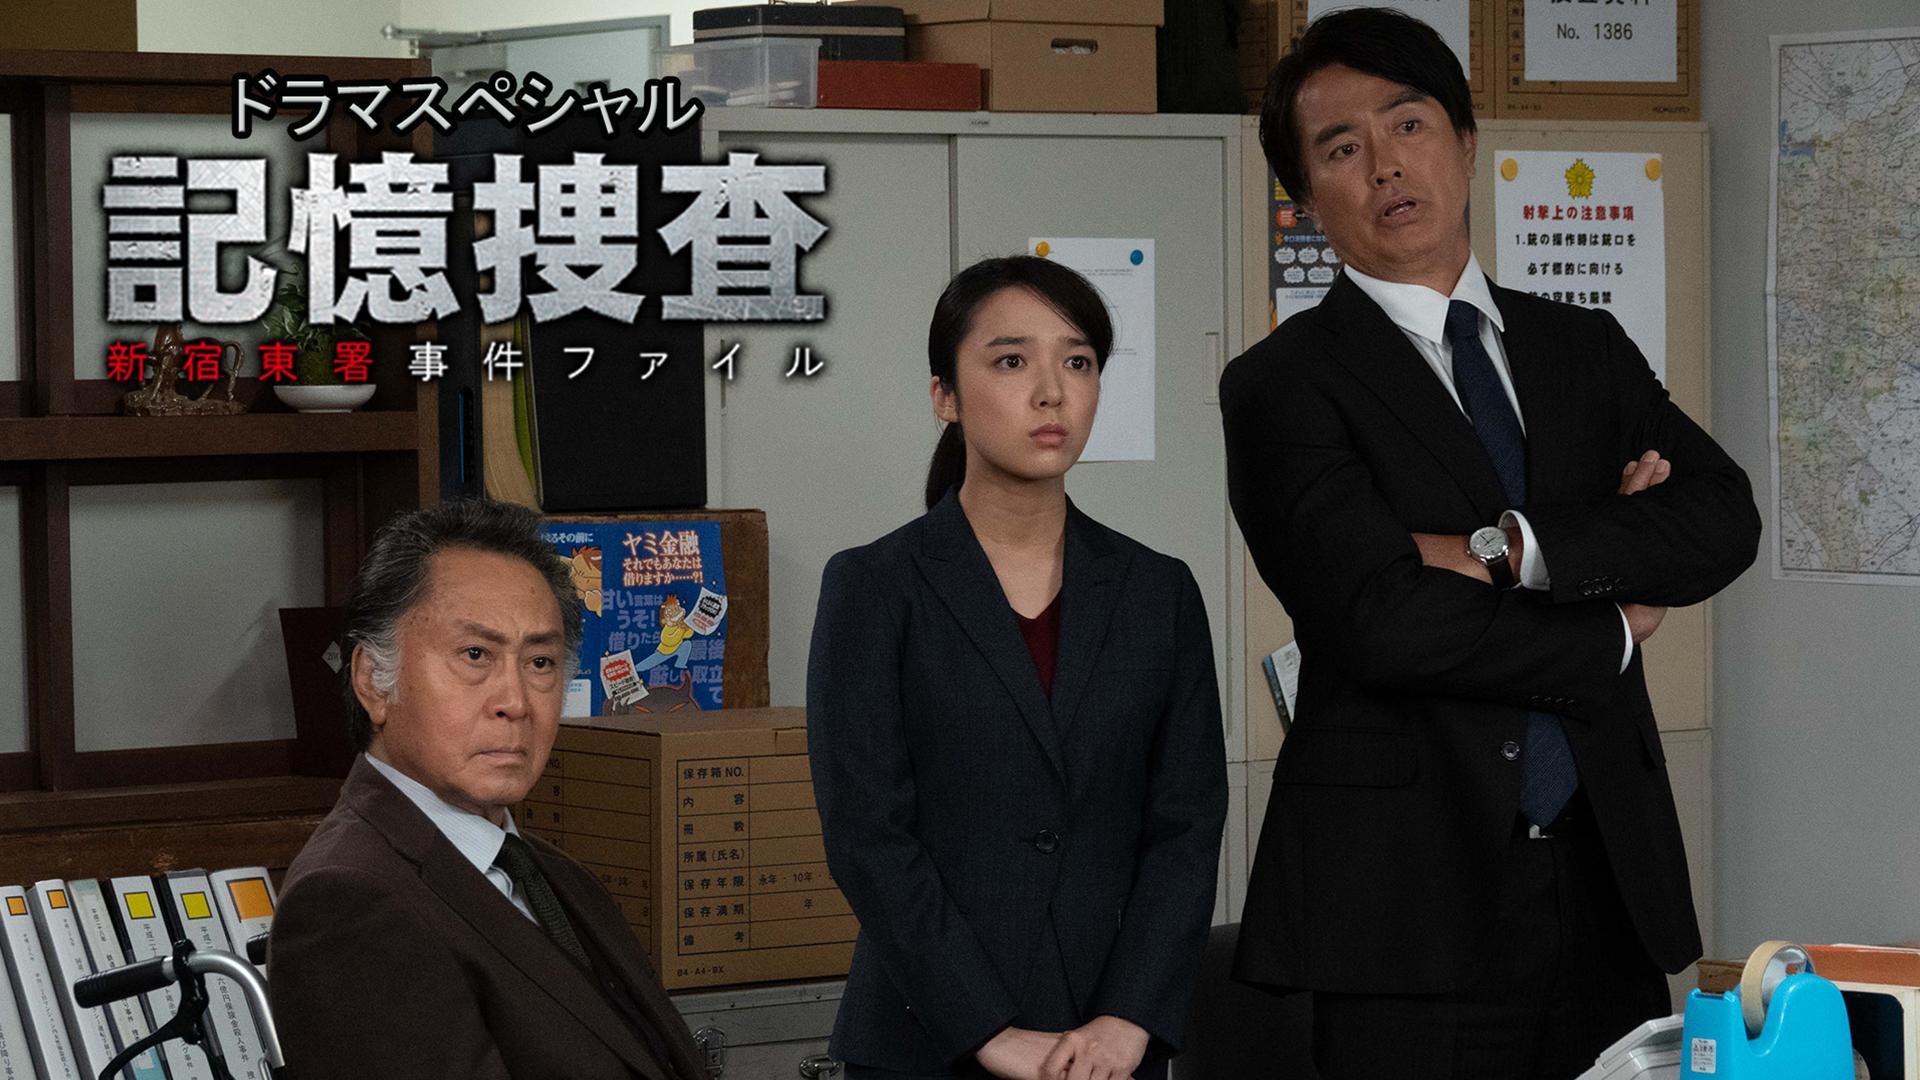 記憶捜査 新宿東署事件ファイル